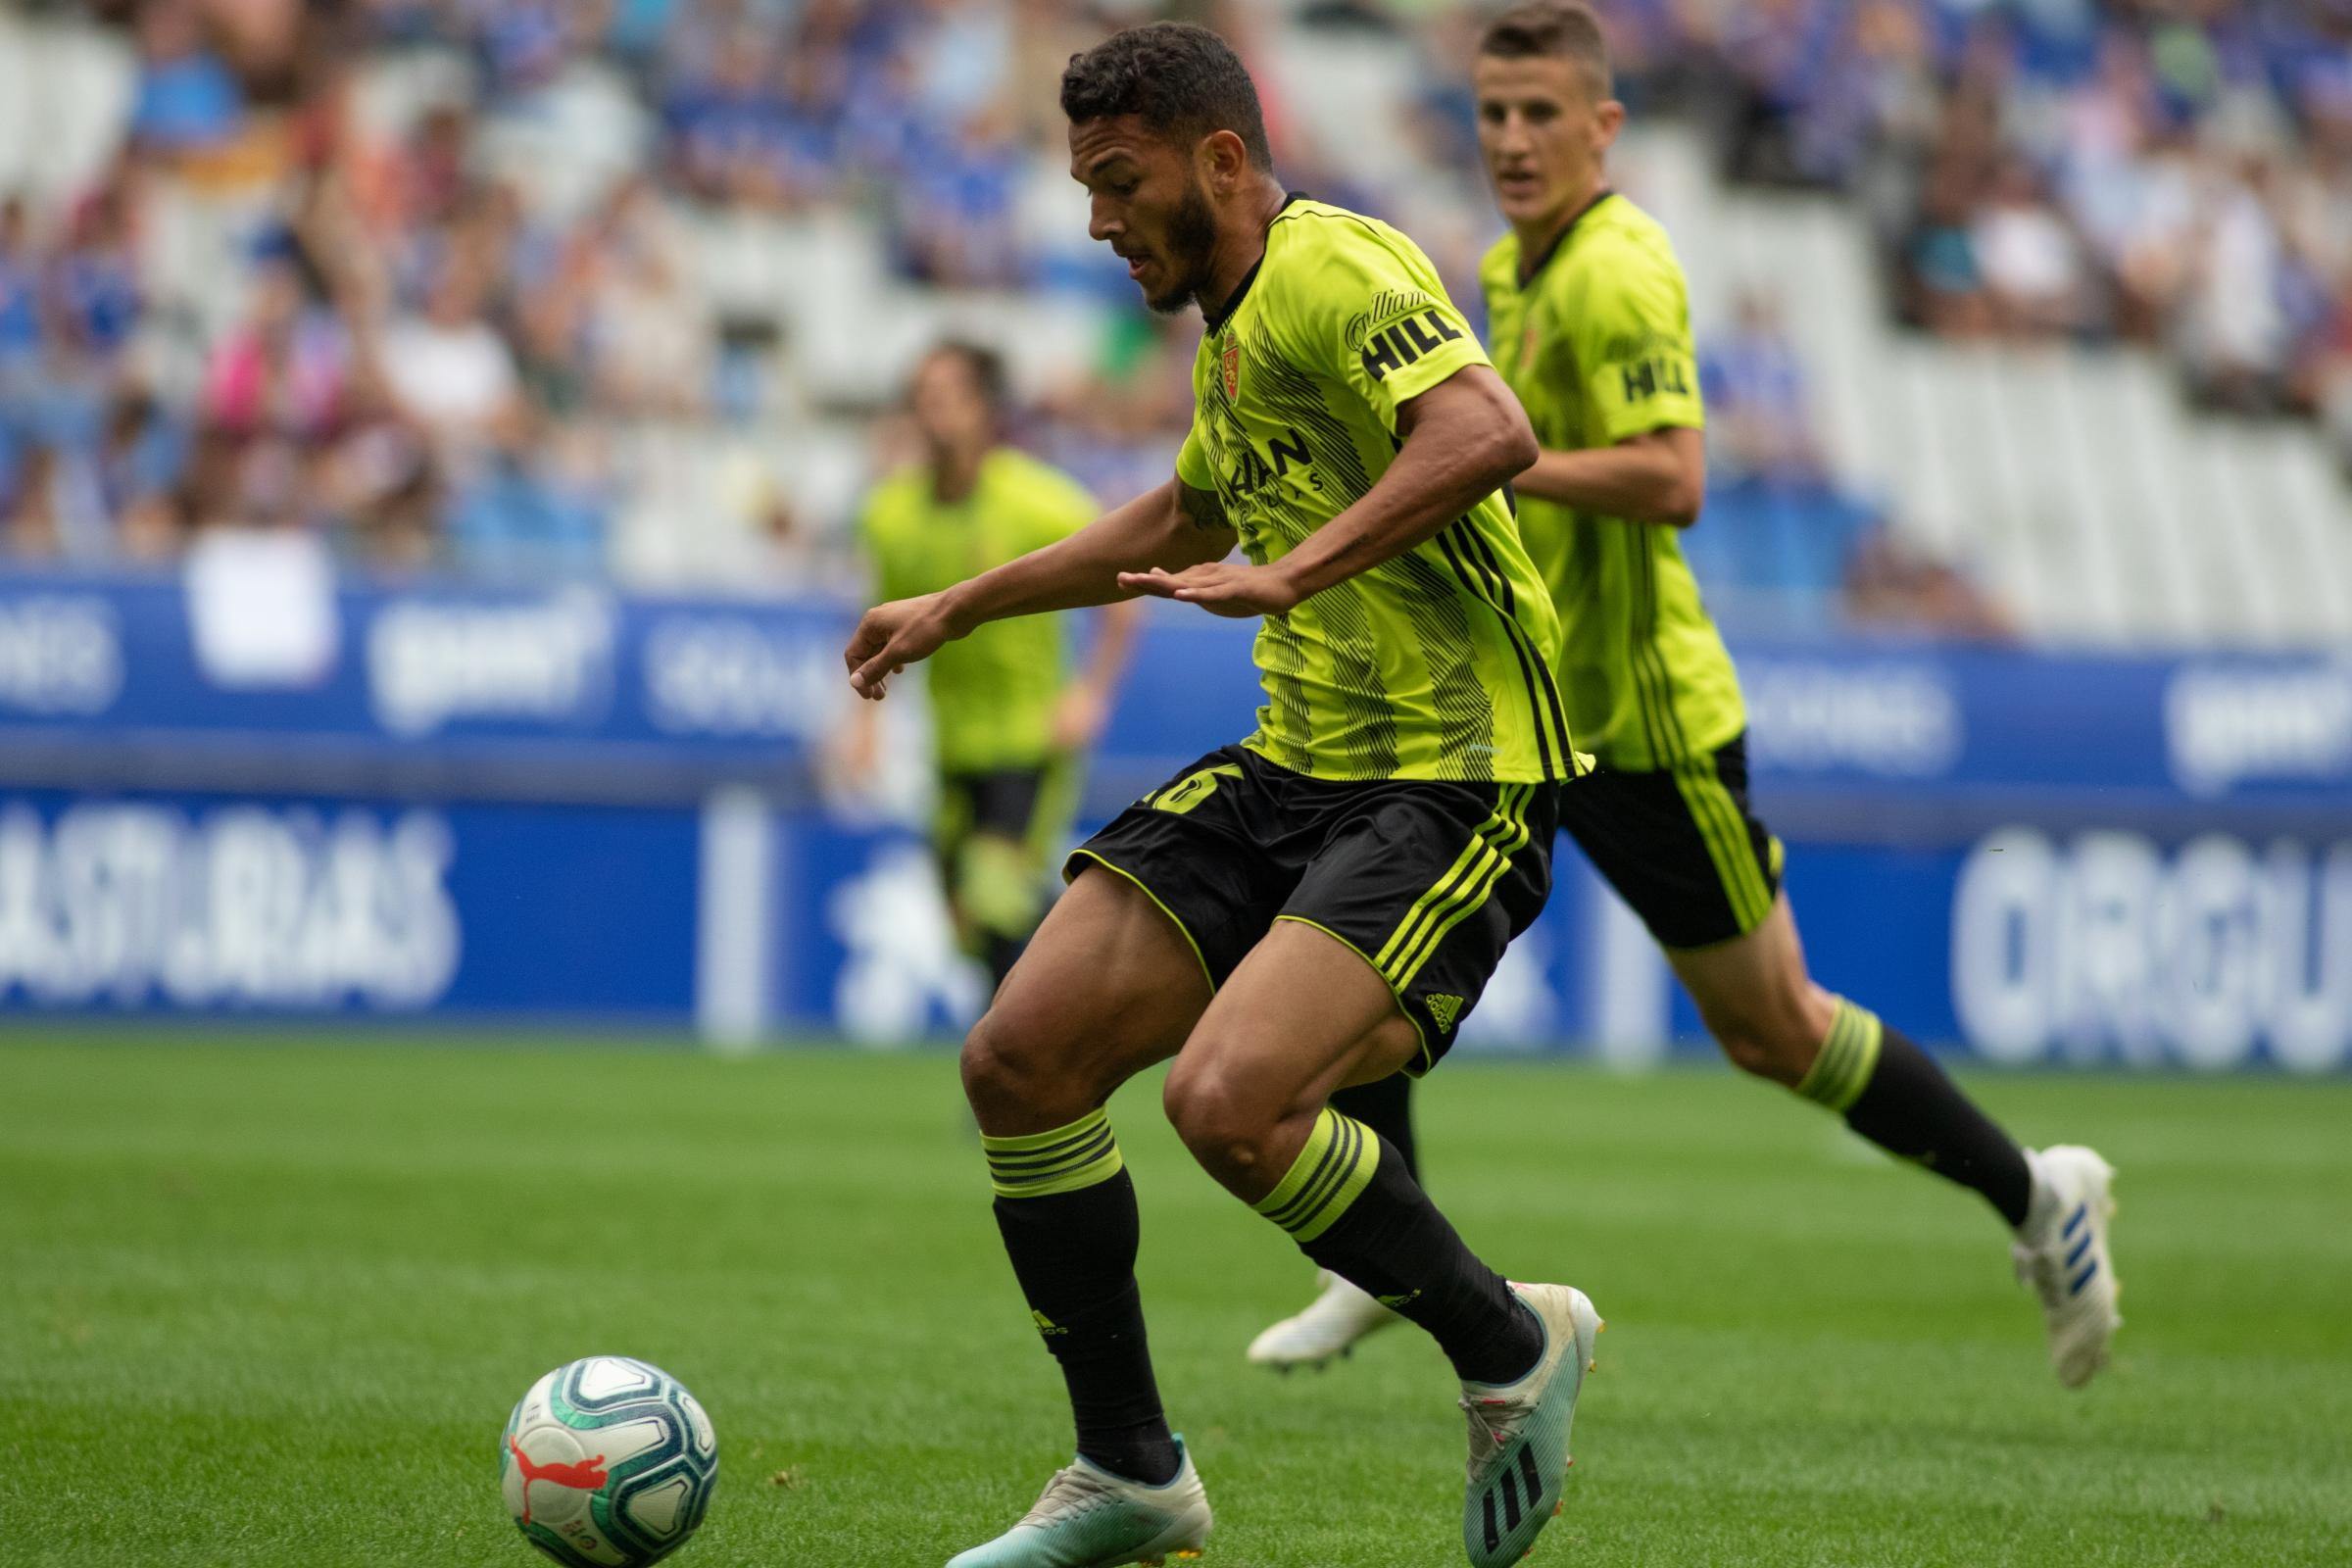 Watford's Luis Suarez will remain at Real Zaragoza this season amid Barcelona emergency signing interest | Watford Observer